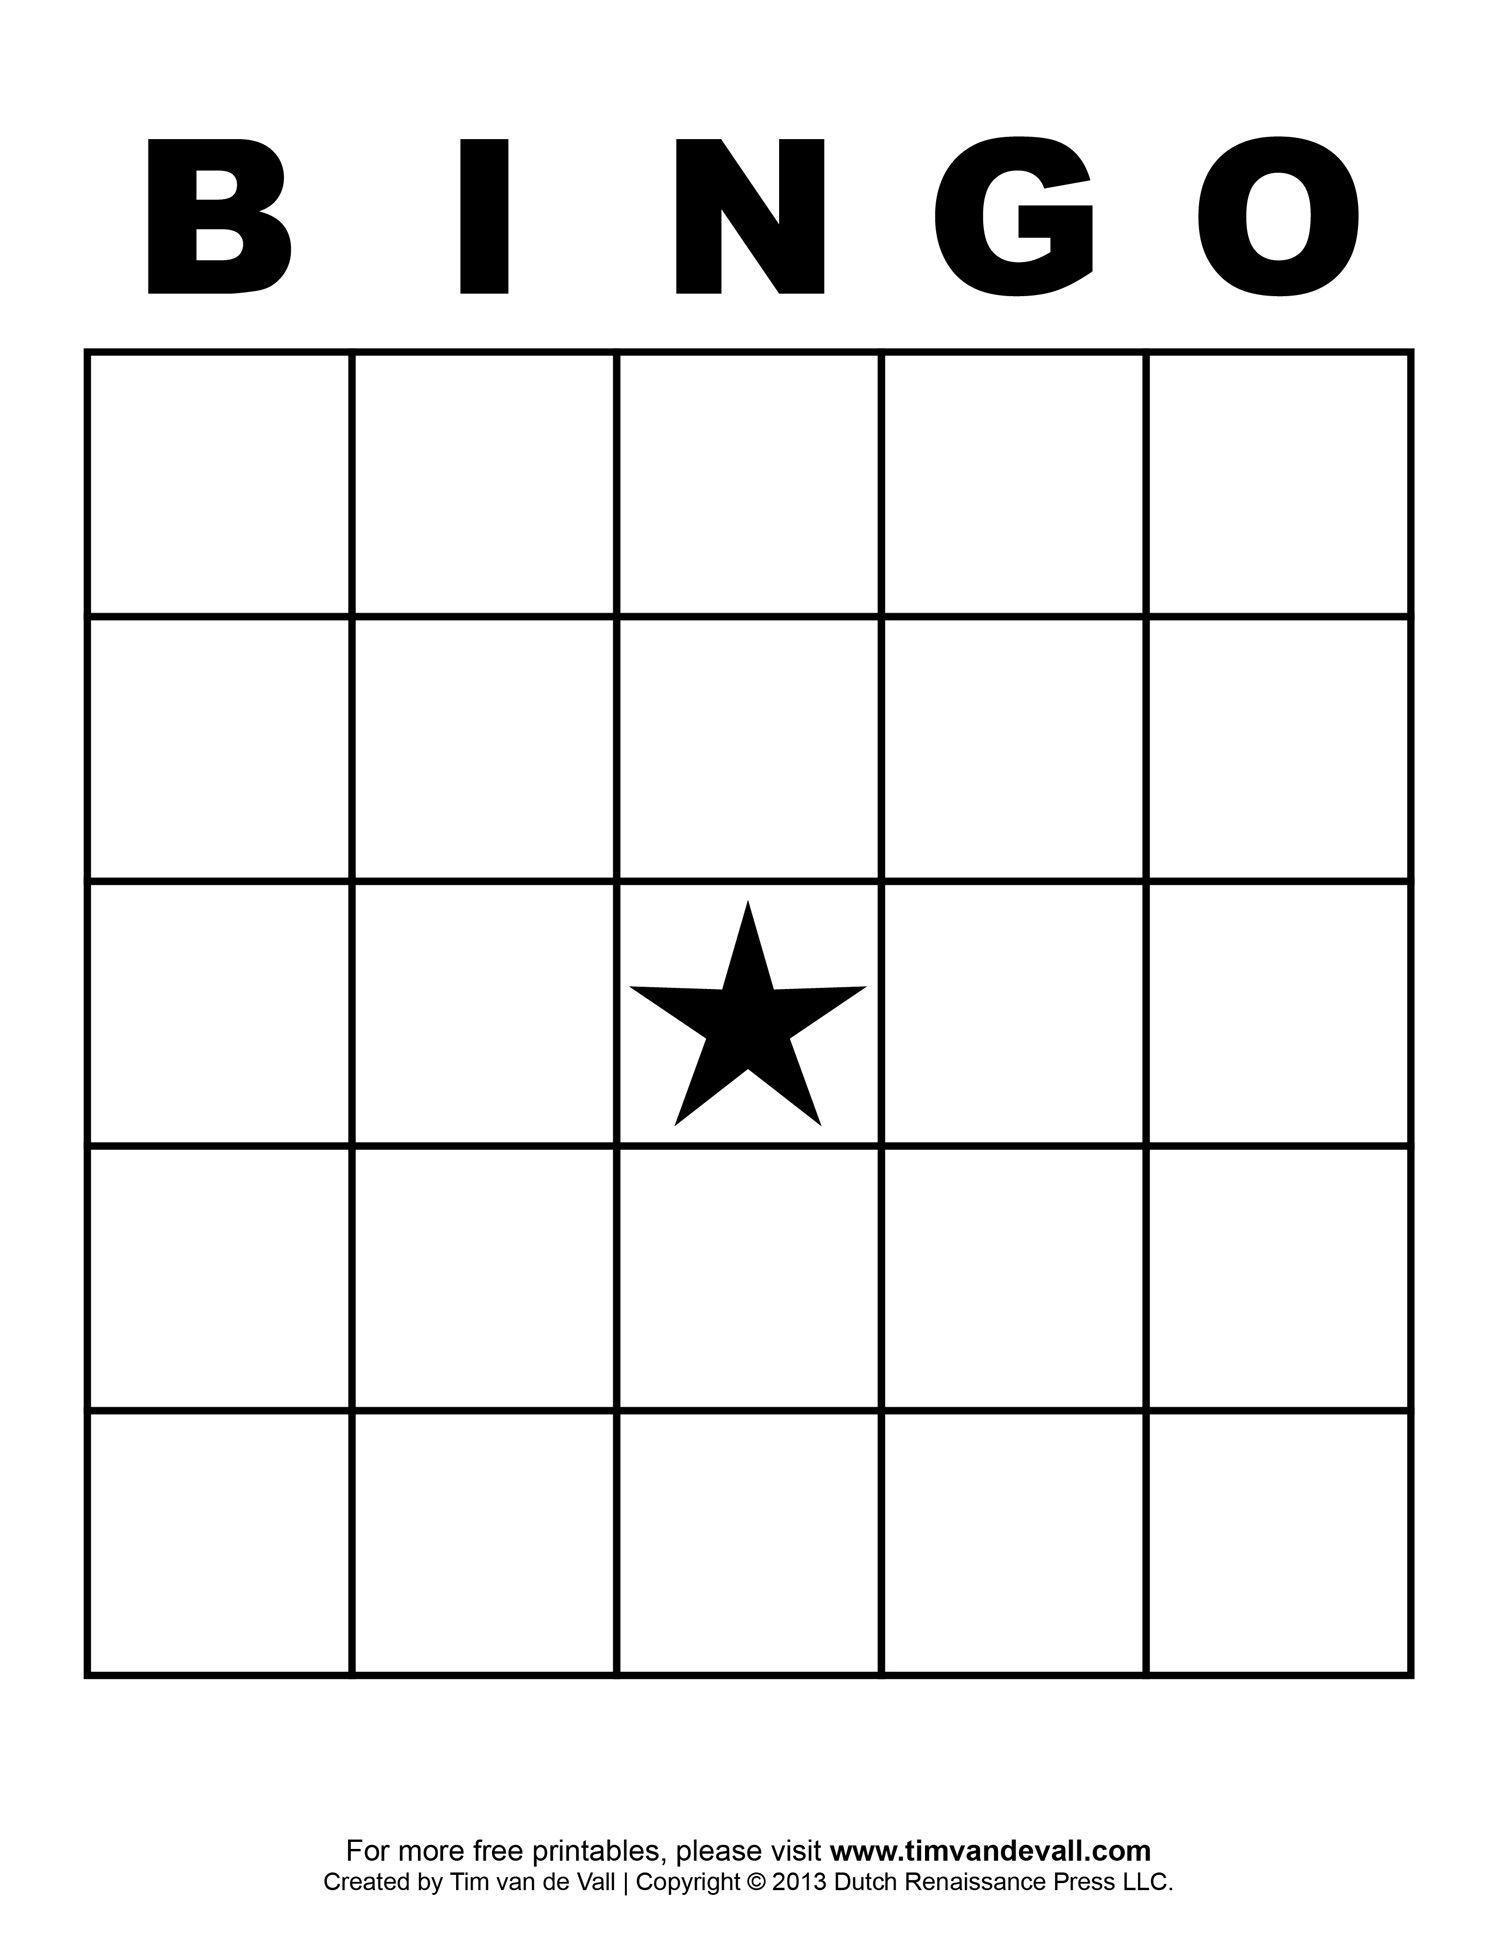 Free Printable Blank Bingo Cards Template 4 X 4 | Classroom | Sight - Free Printable Bingo Cards And Call Sheet